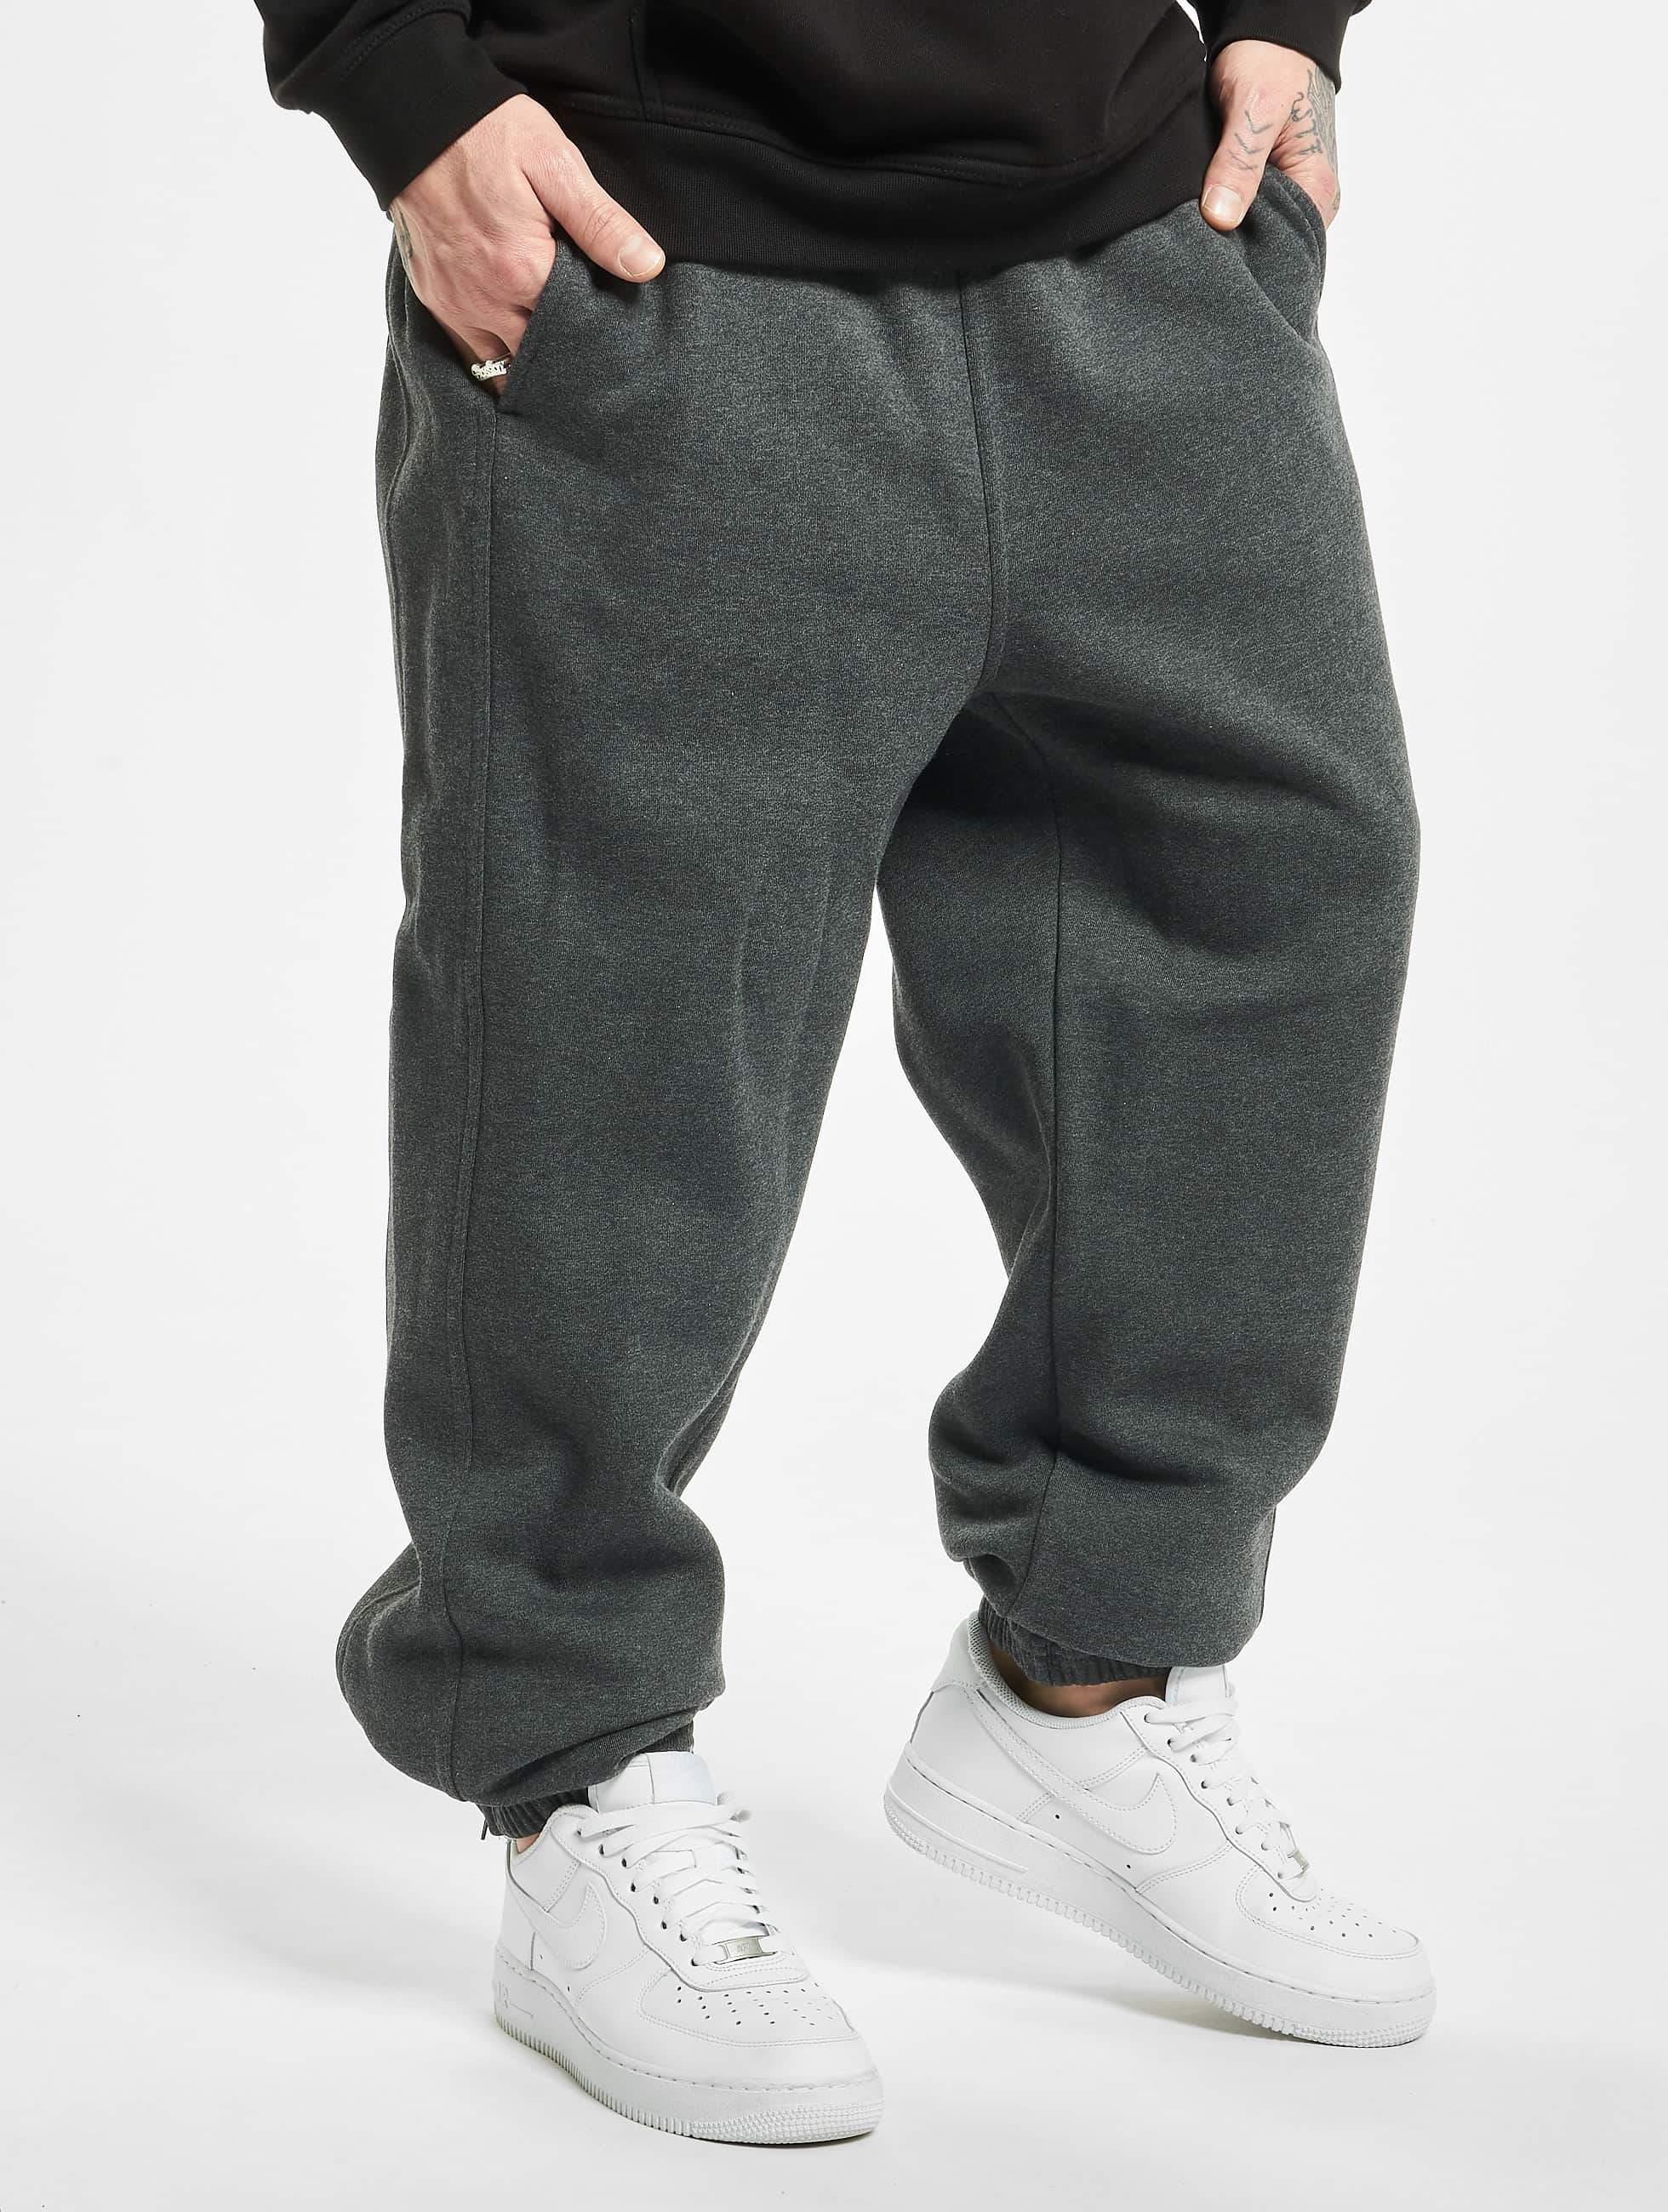 Urban Classics Sweat Classics Classics Urban Pants Charcoal Charcoal Urban Sweat Pants rsCdxhQt